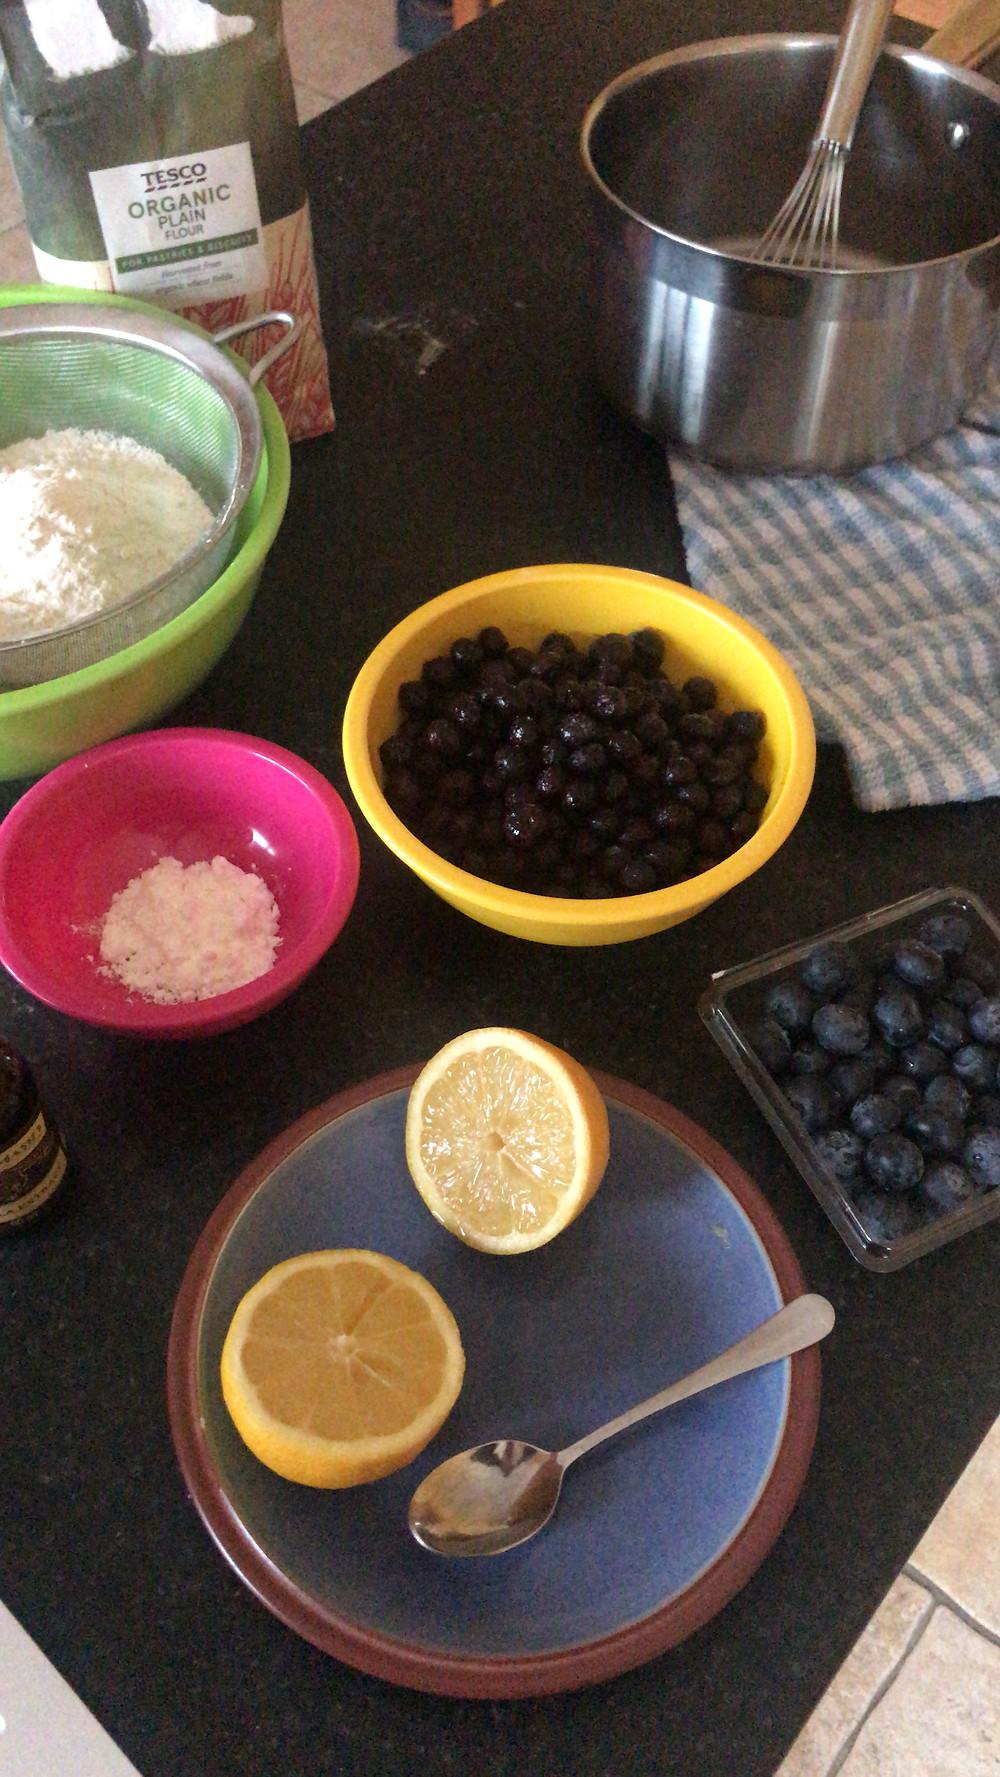 Ingredients for blueberry vegan pop tarts.